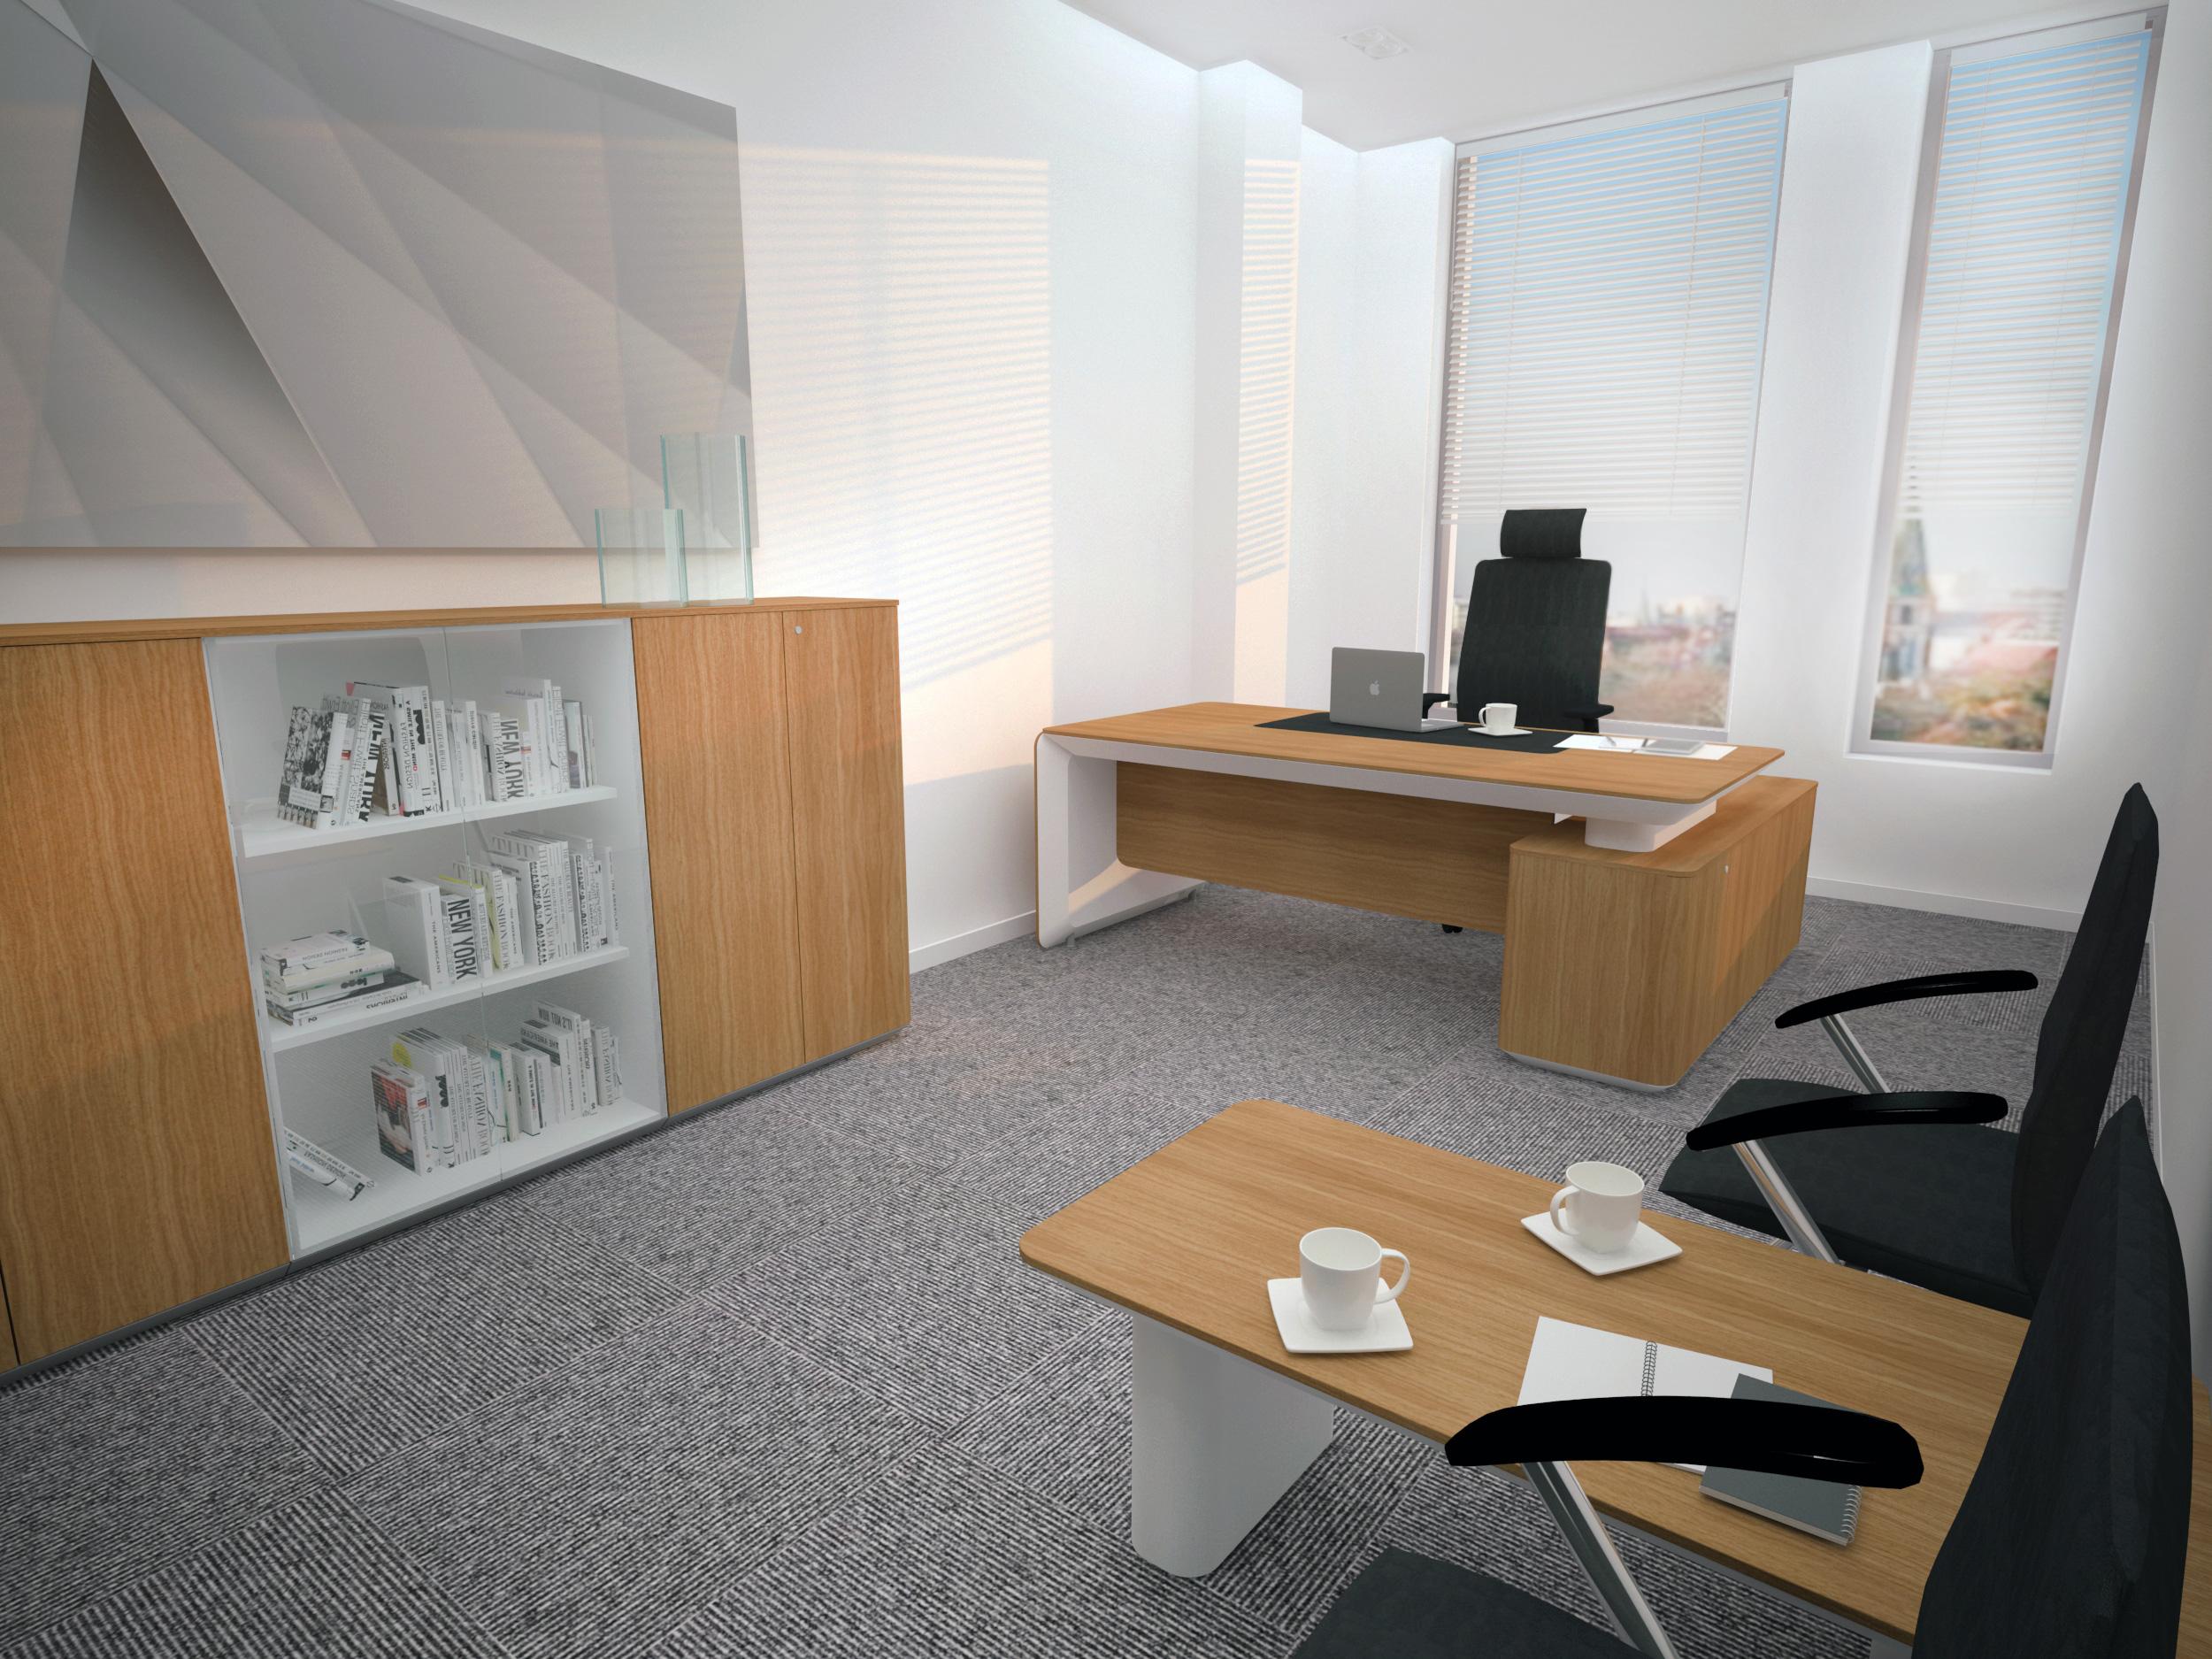 bergerat monnoyeur, budynek biurowo-serwisowy, biuro, wnetrze, kawa